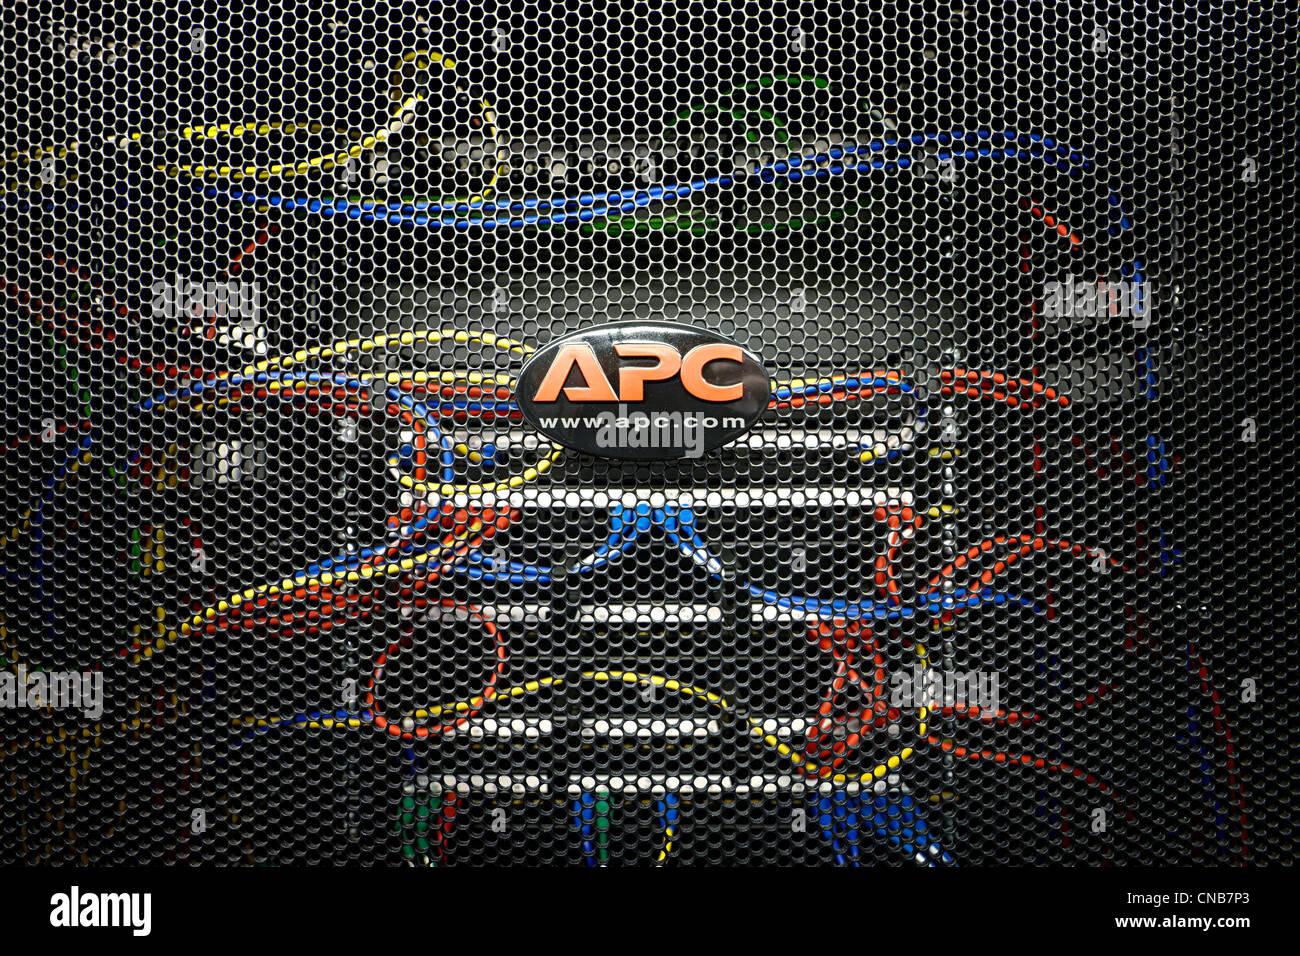 APC logo on server rack - Stock Image